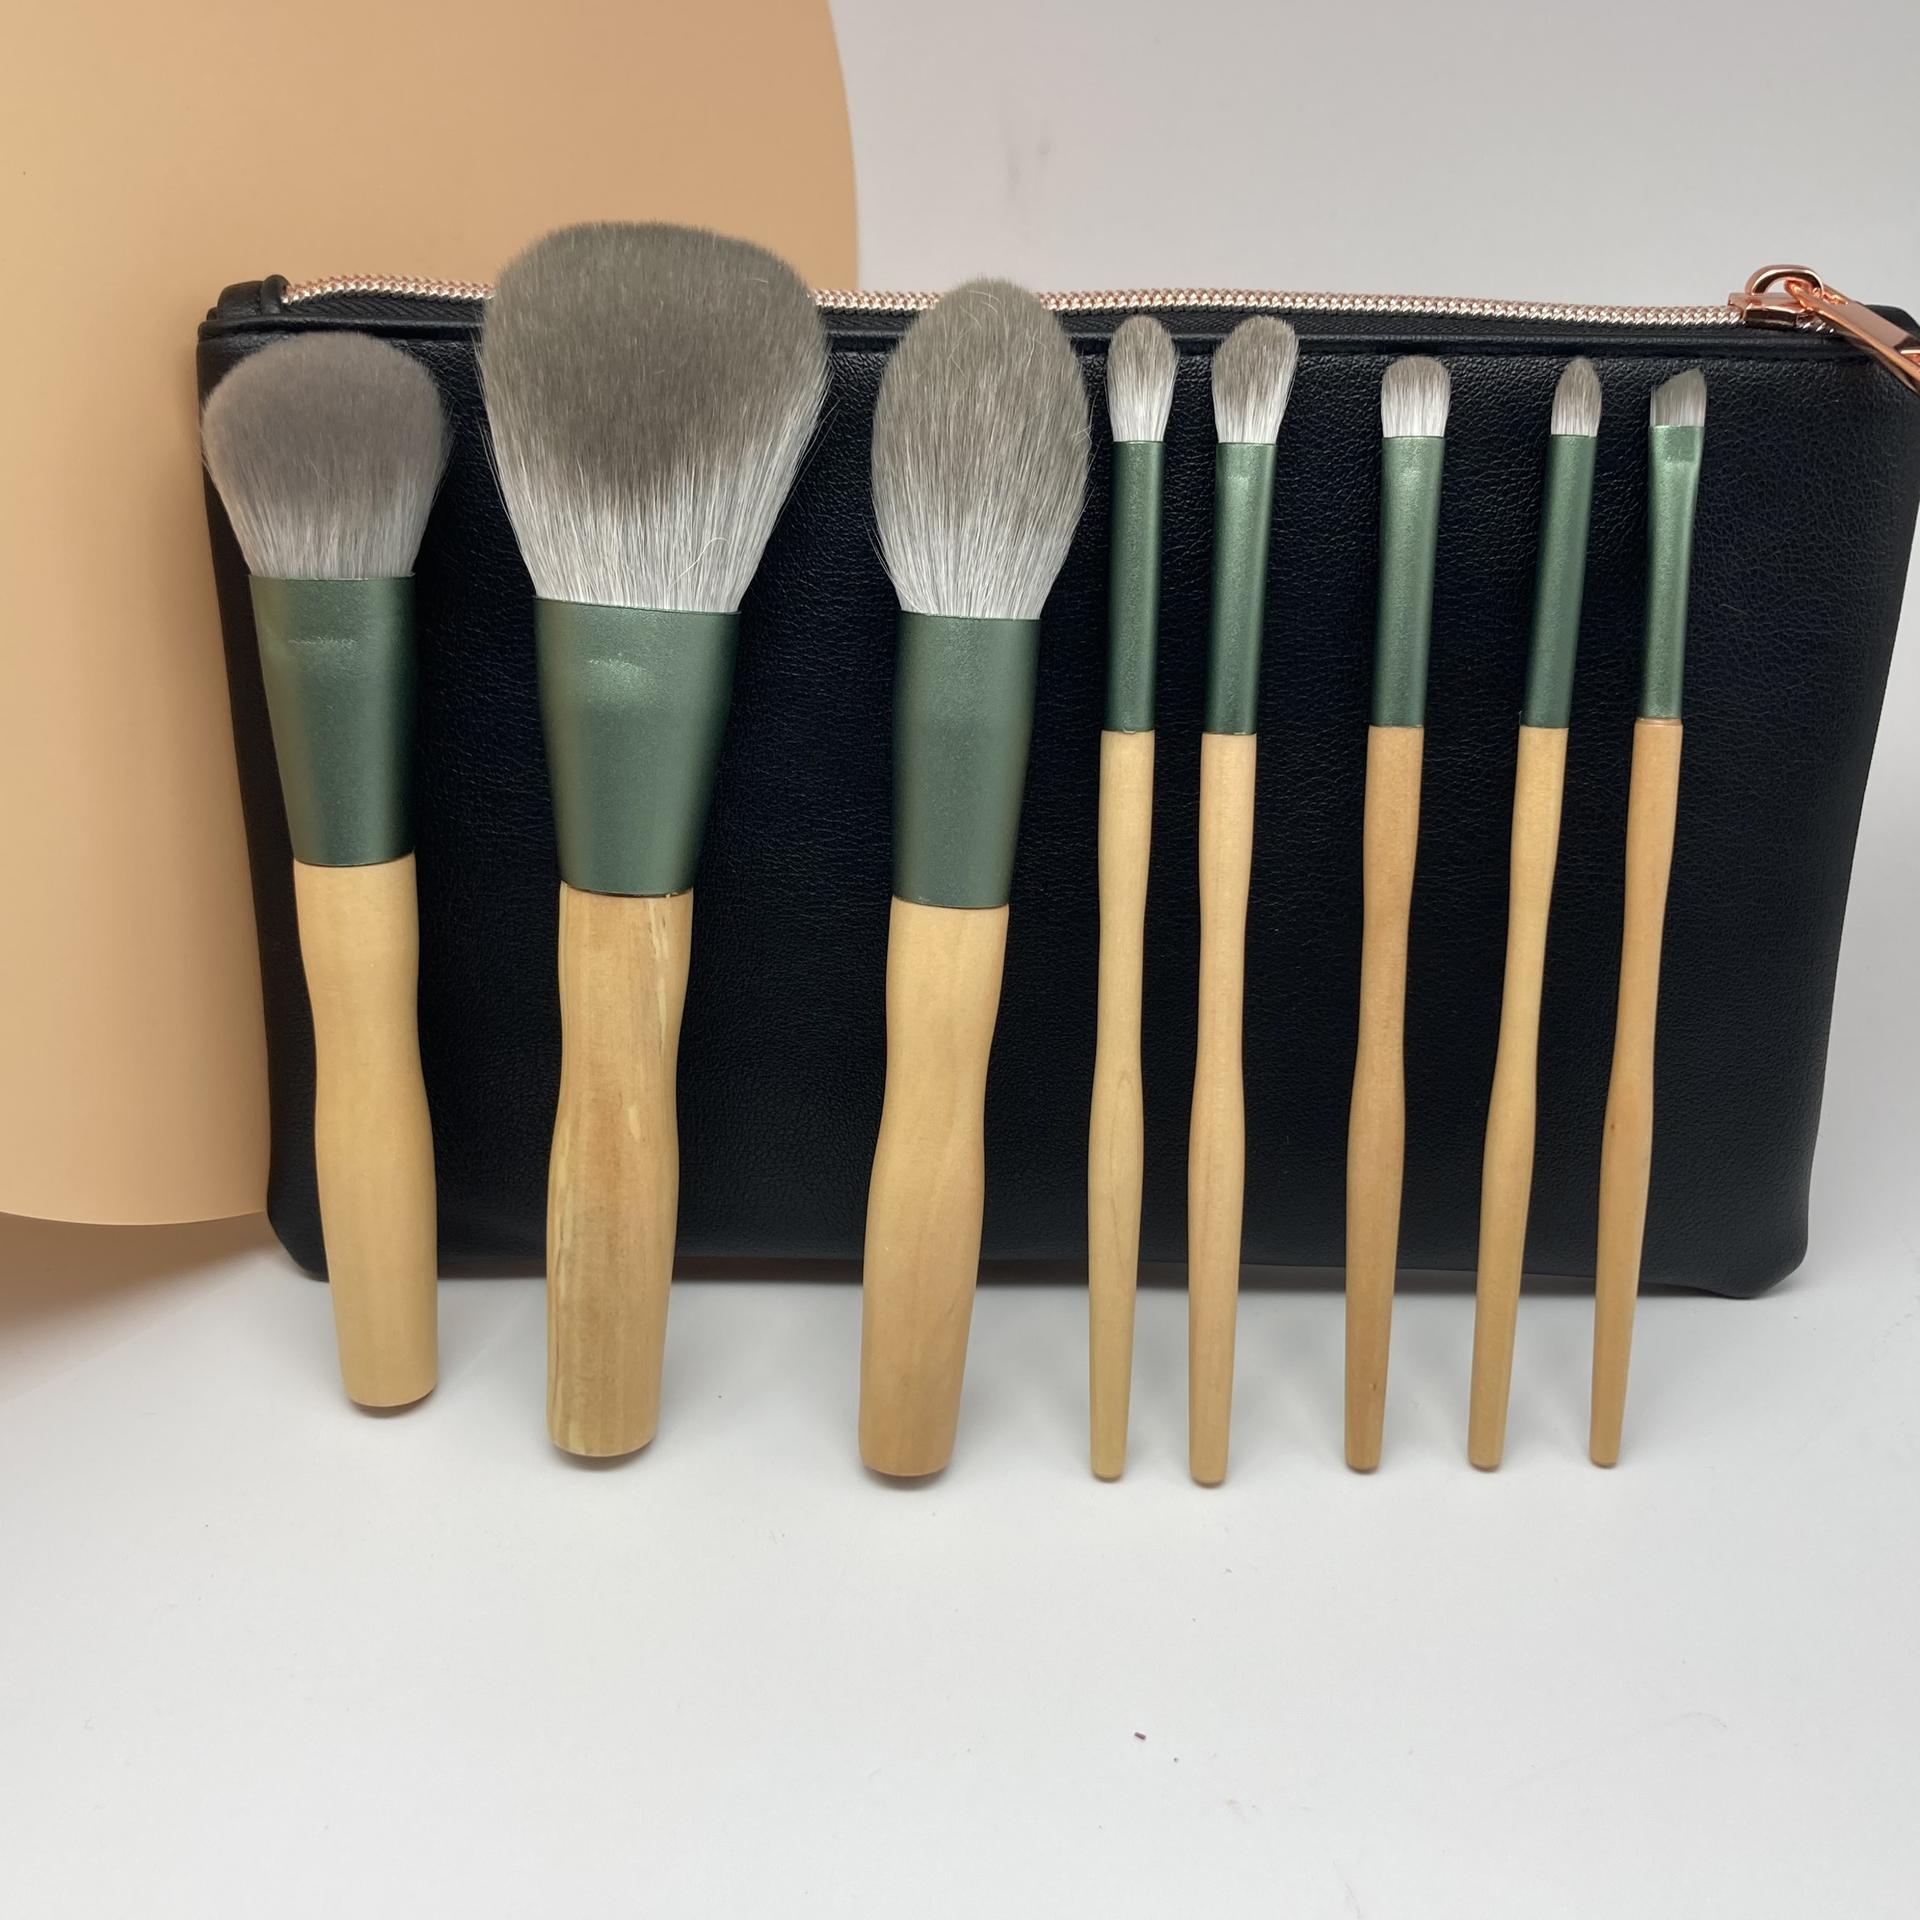 Soft vegan makeup brushes private label make up cosmetics brushes